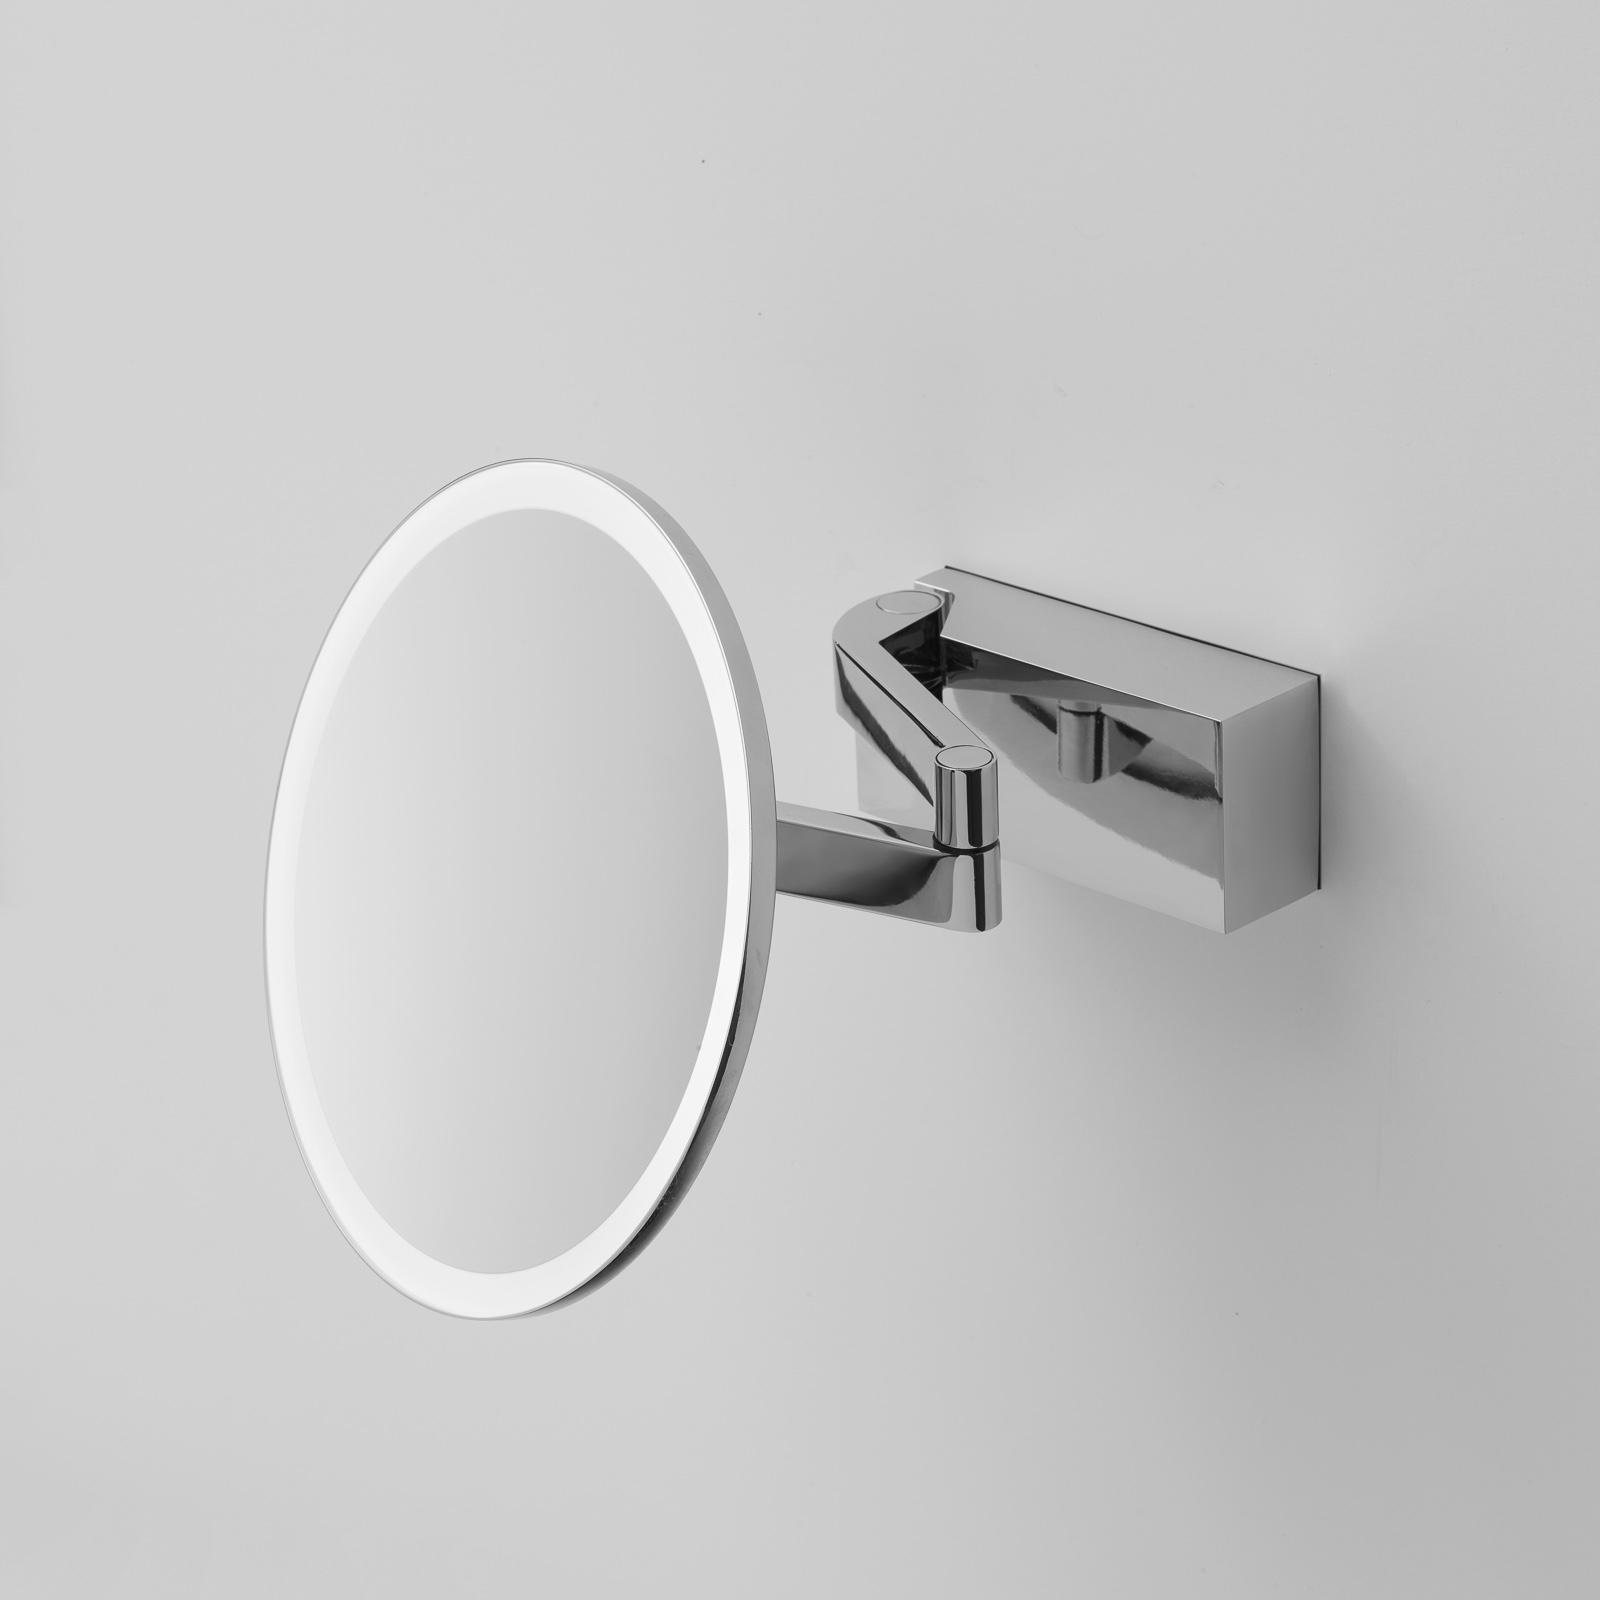 Decor Walther Vision R LED-kosmetikspejl, krom